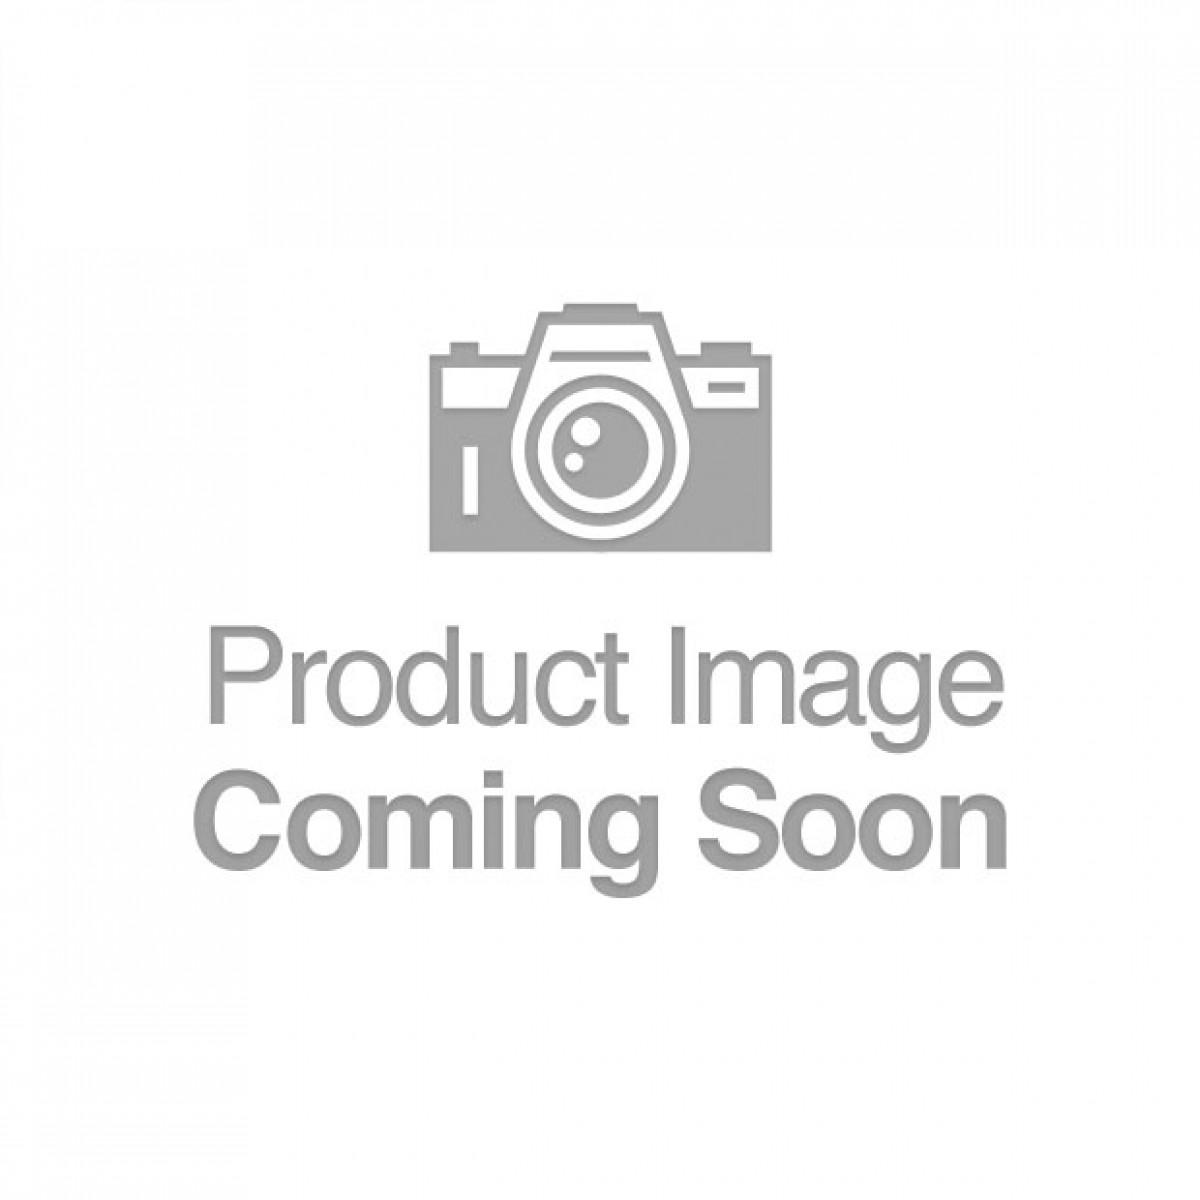 Fantasy for Her Ultimate Pleasure 24K Gold Seasonal Luxury Edition w/Travel Bag Luxury Box - Red